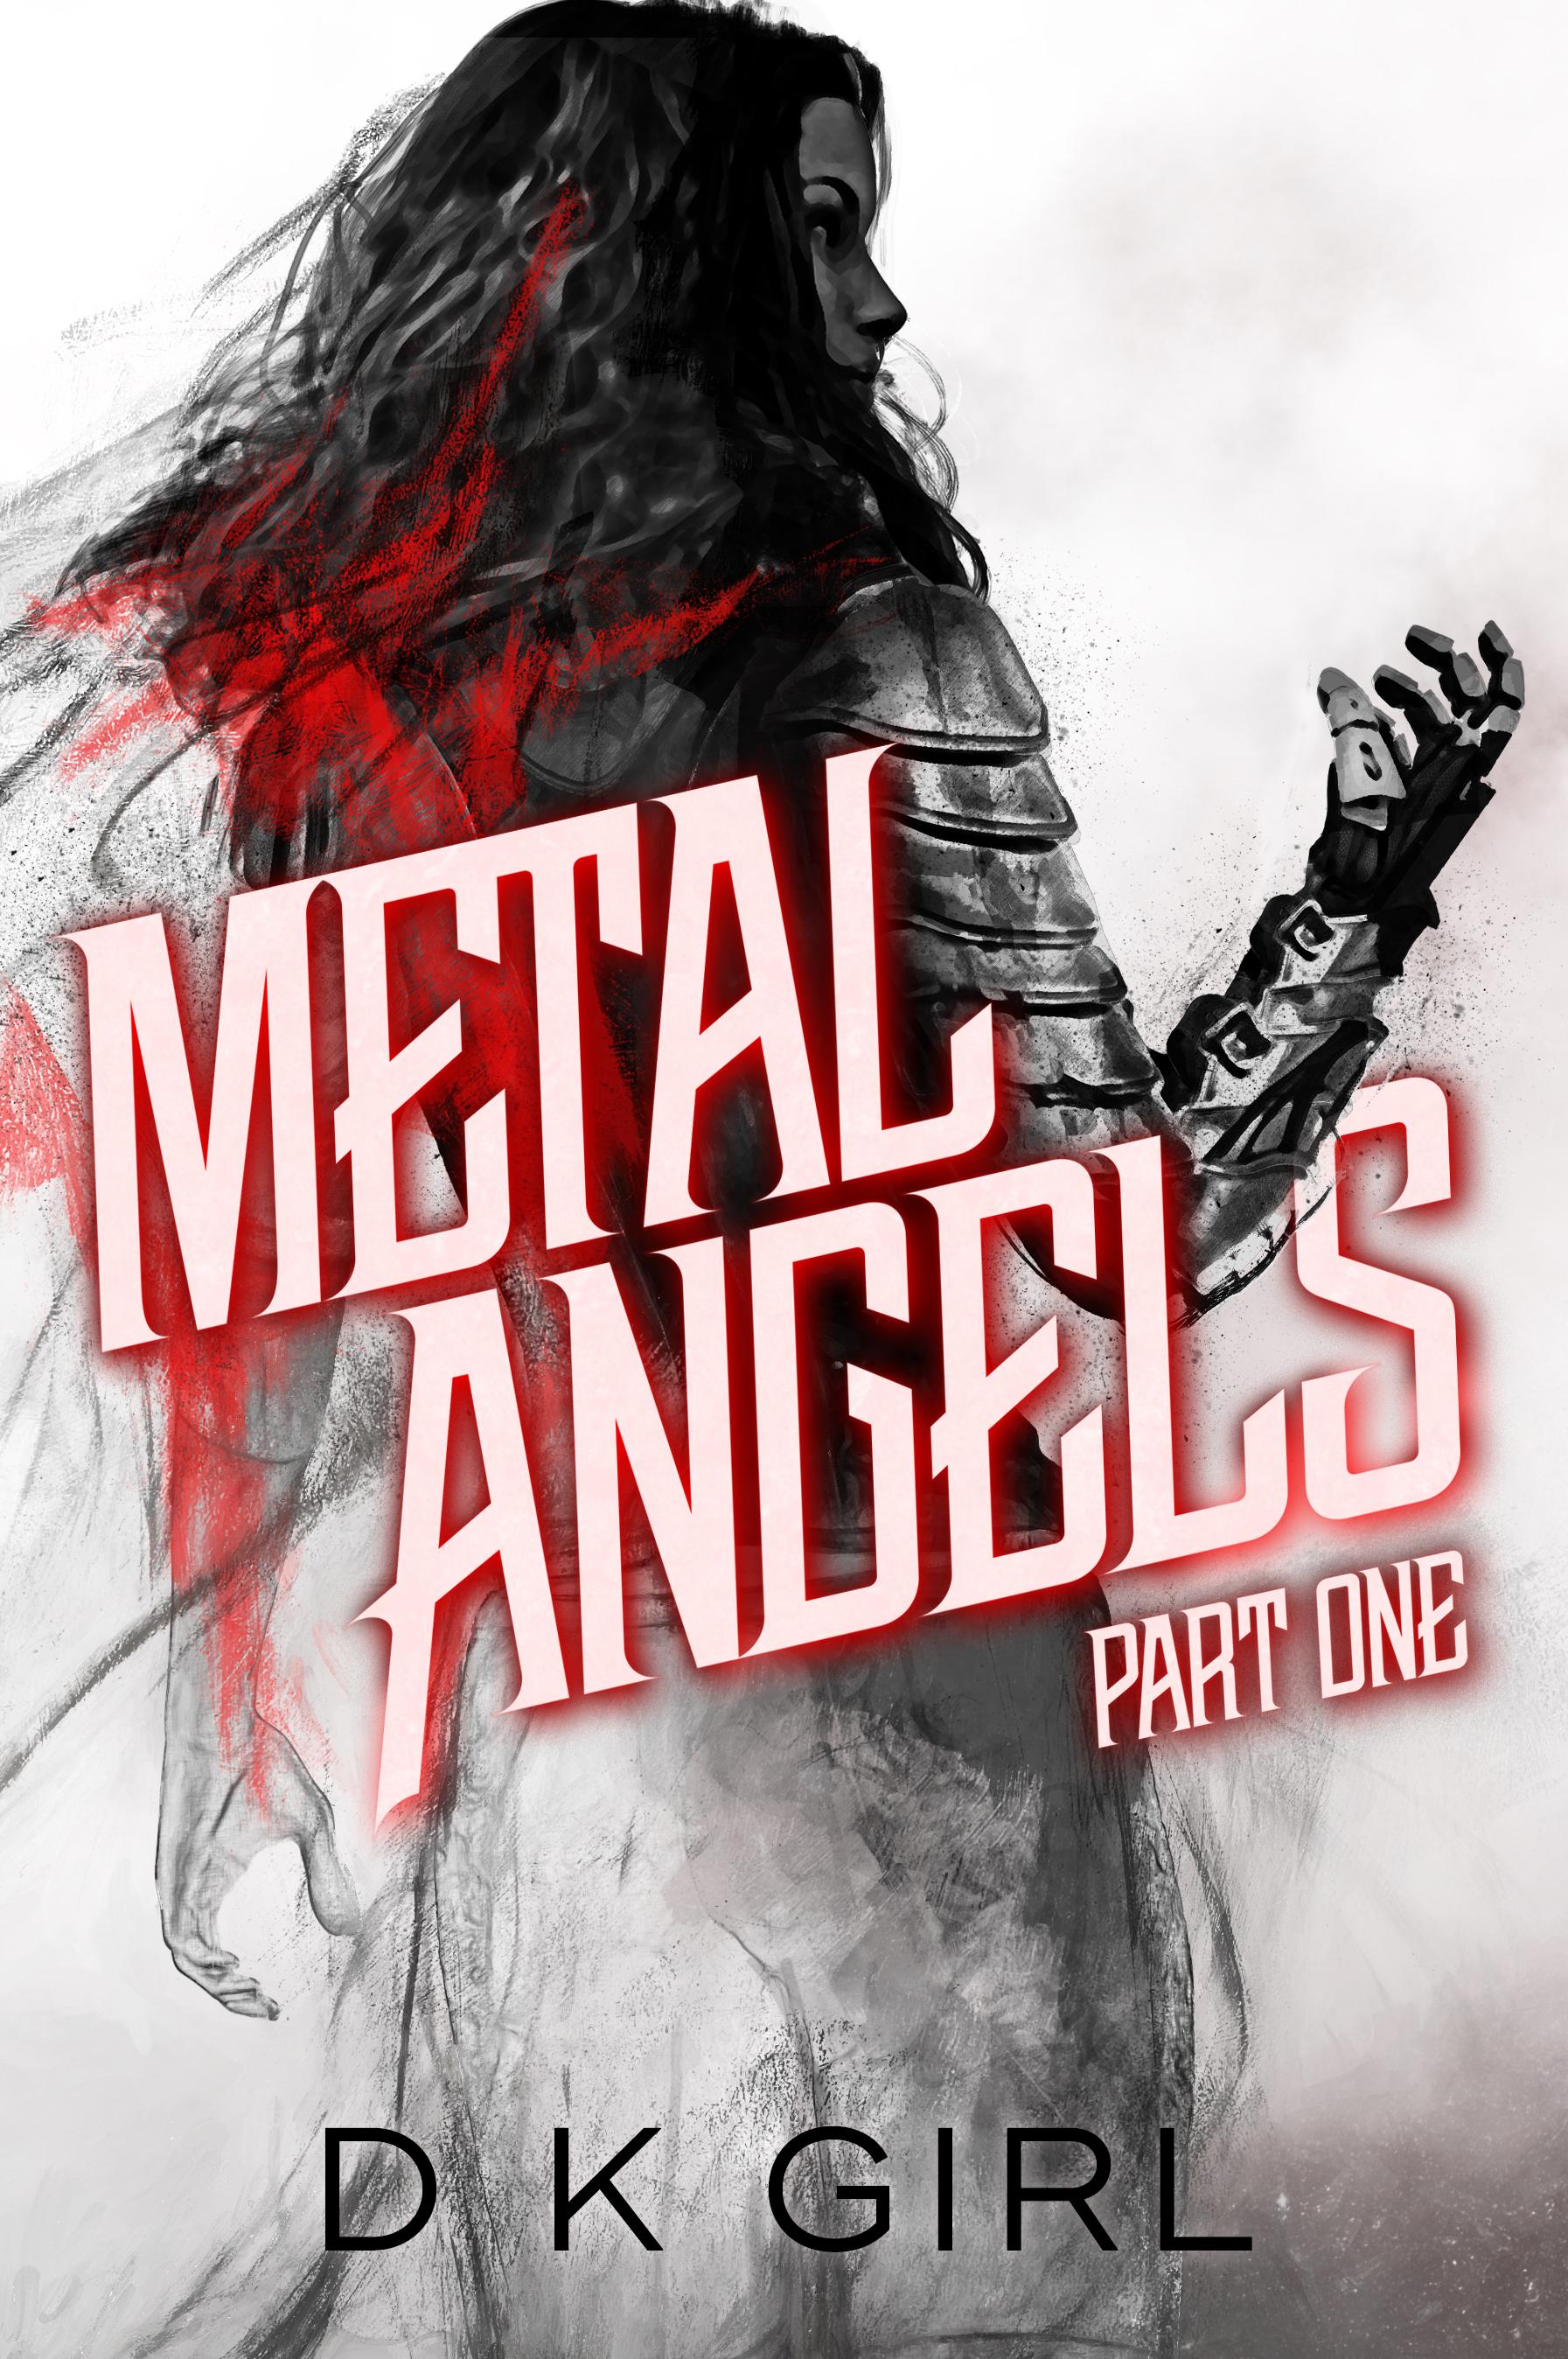 Metal_Angels_Part_One FINAL